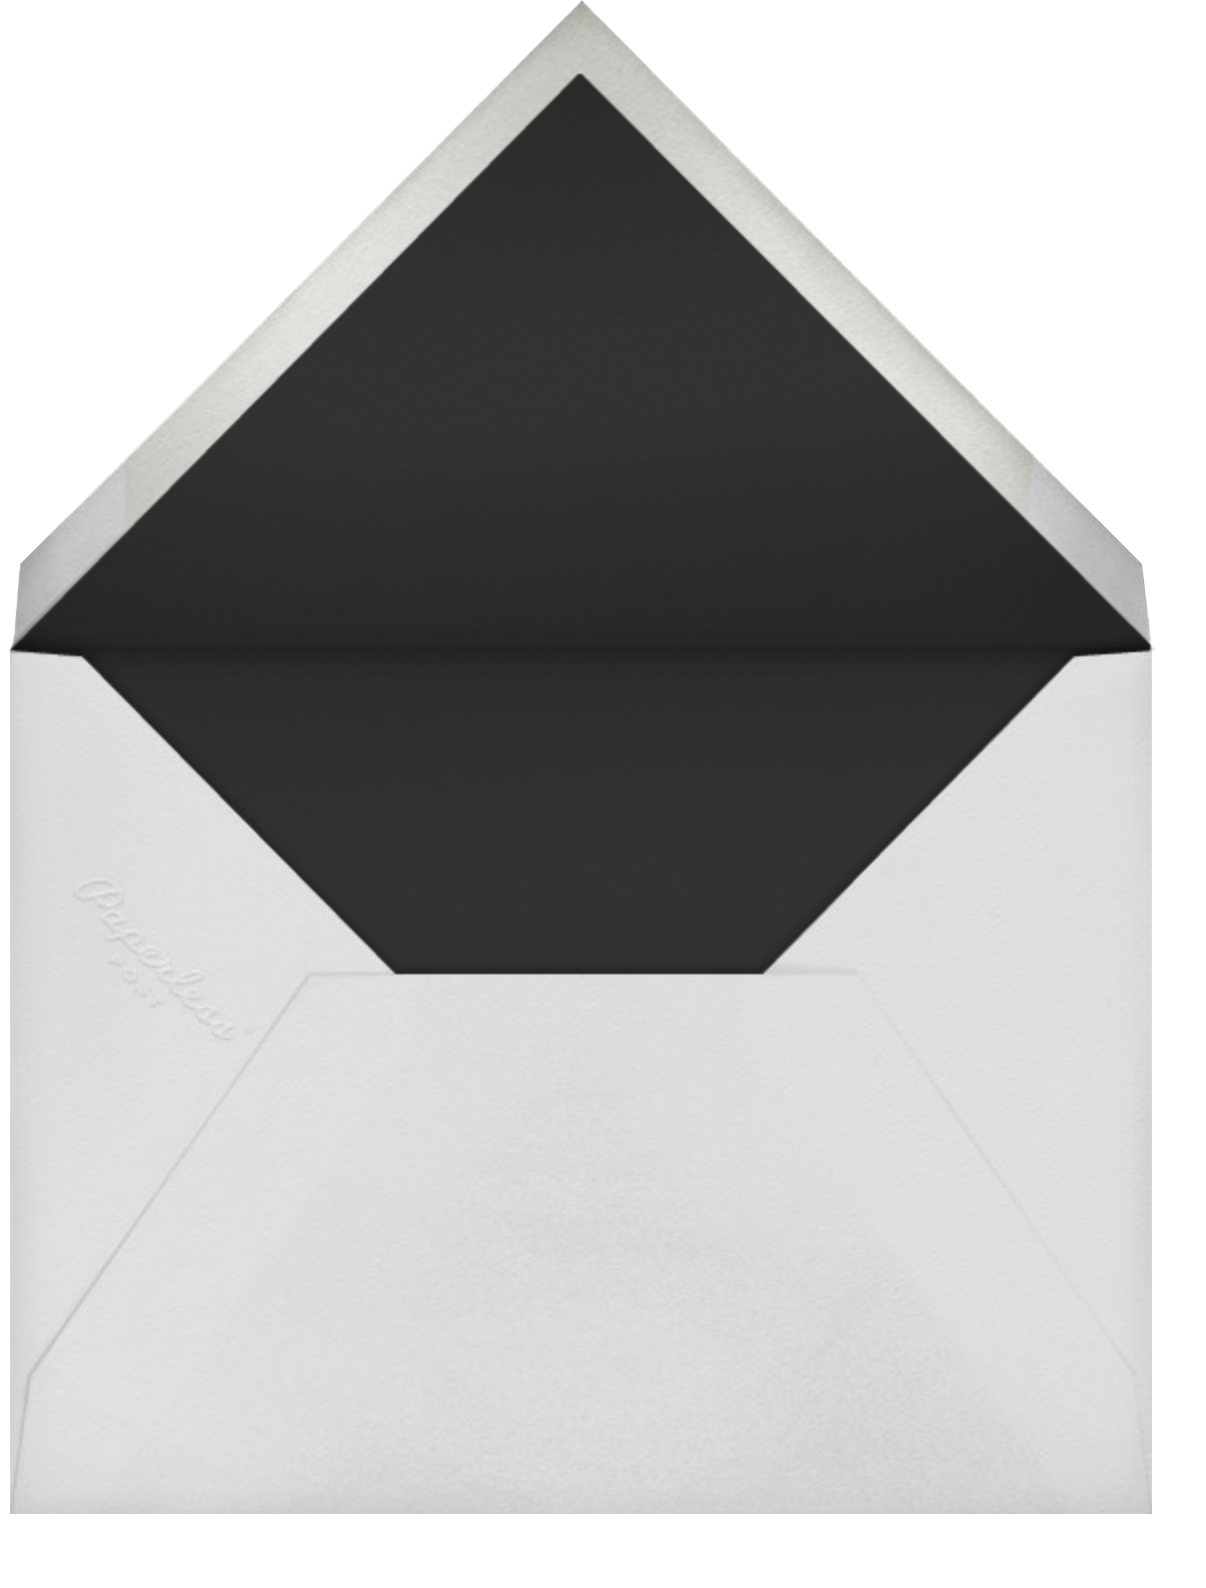 Ampersand (Stationery) - Black - kate spade new york - null - envelope back